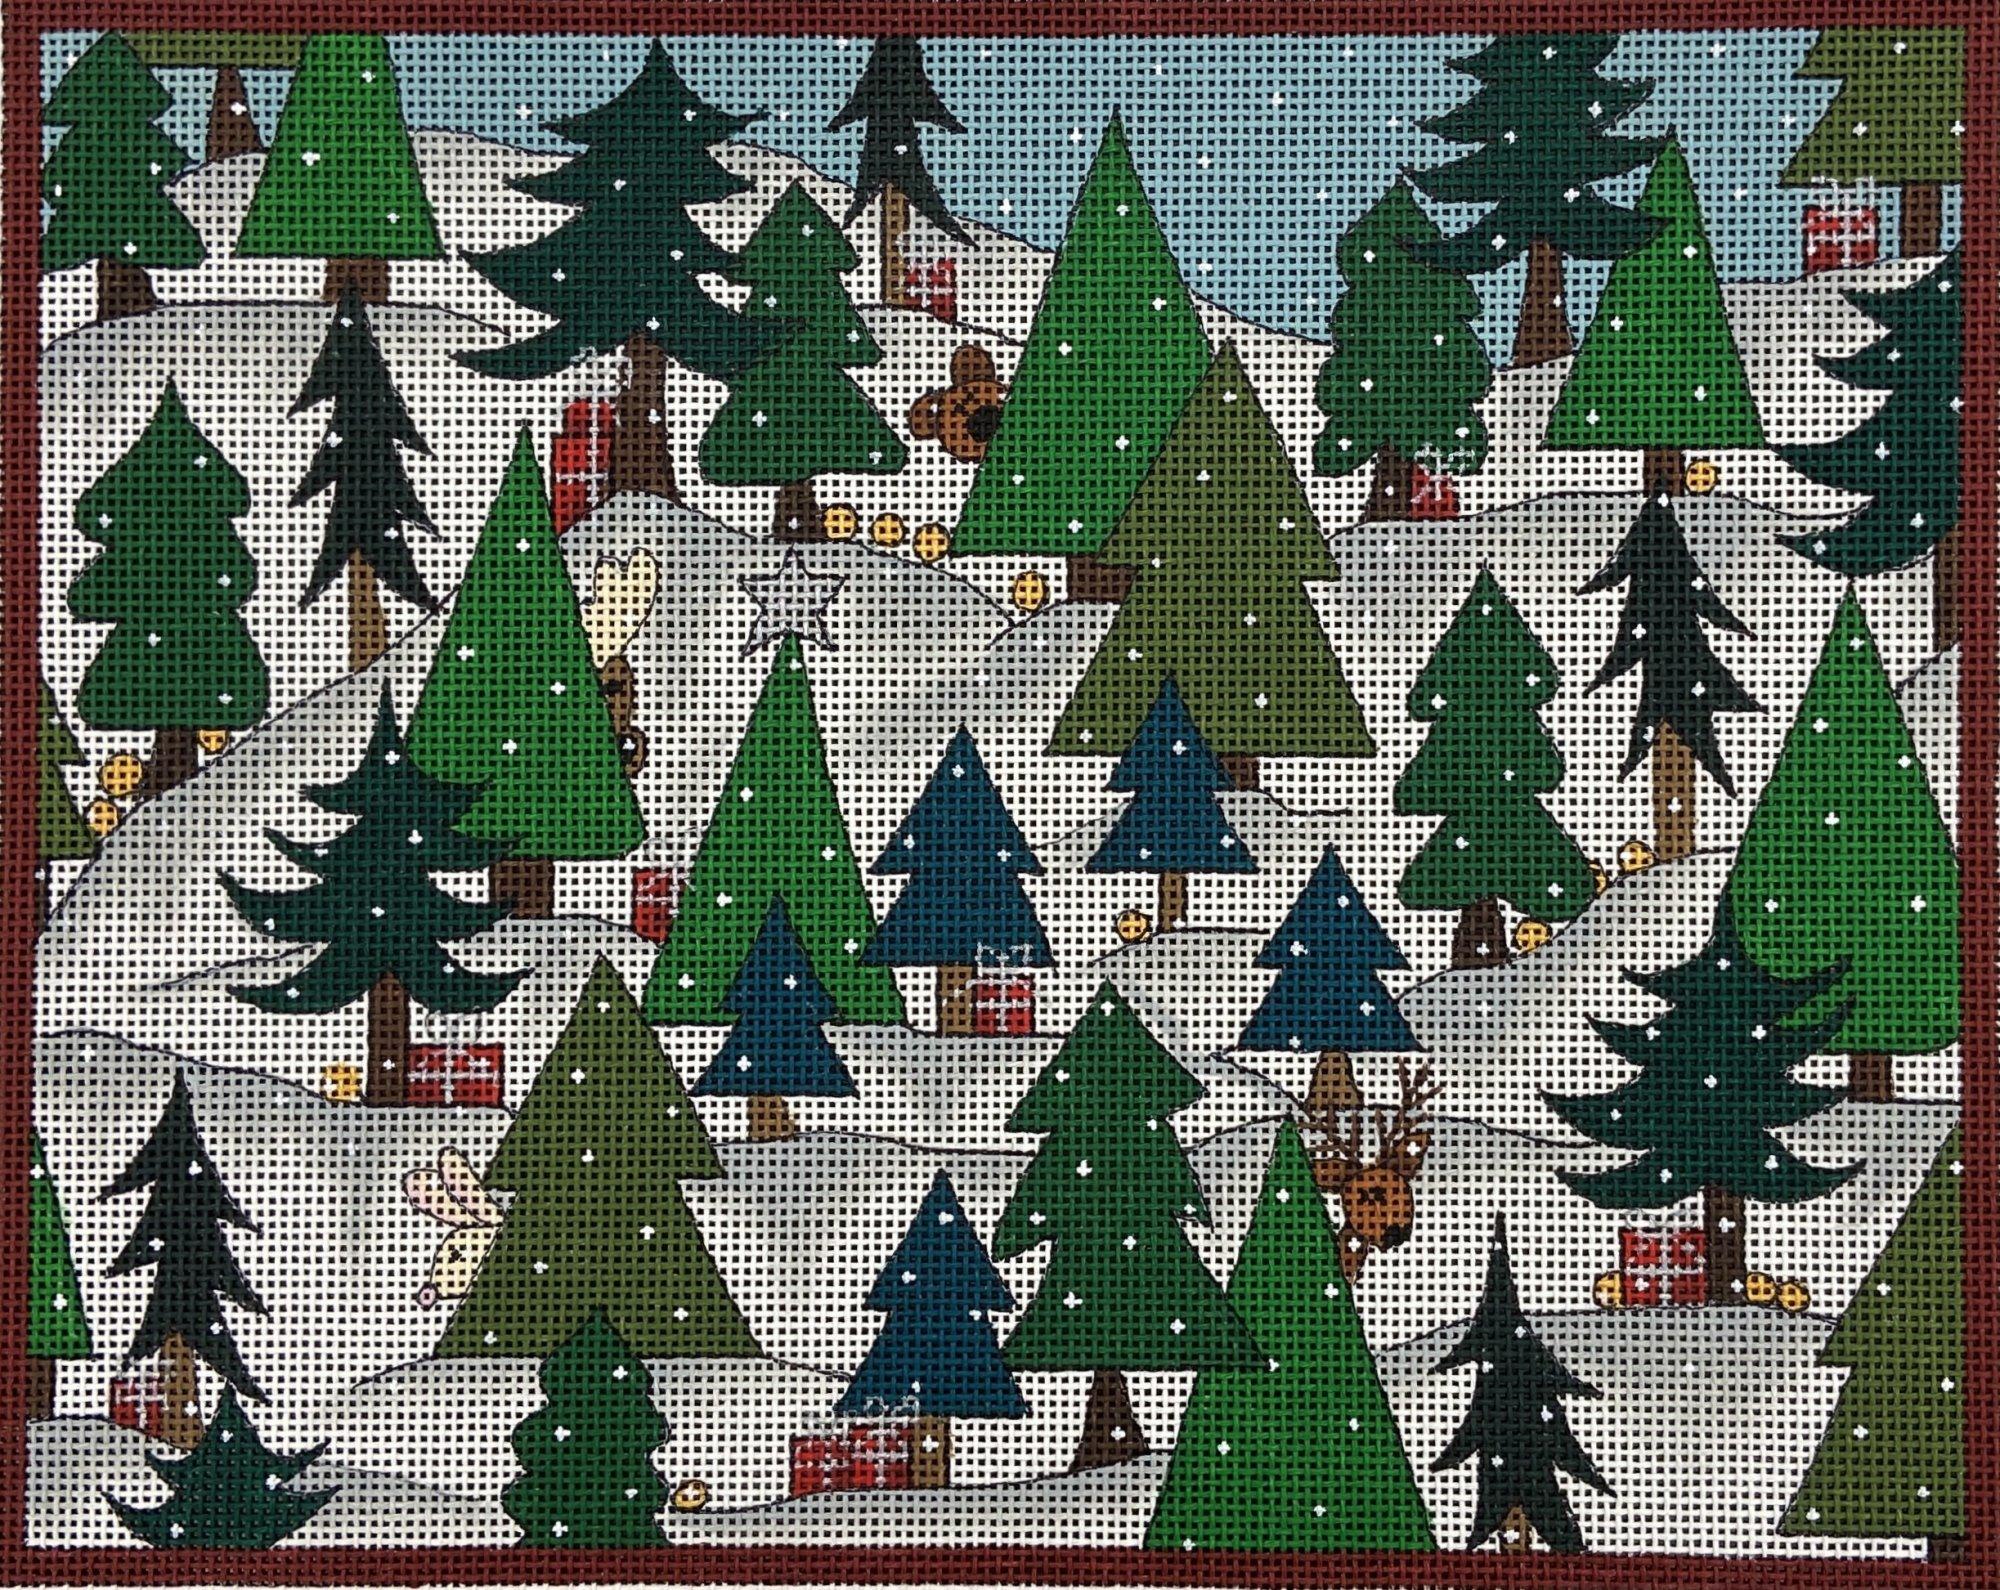 RN215 Winter Woodland Peek-a-boo with Christmas Trees Renaissance